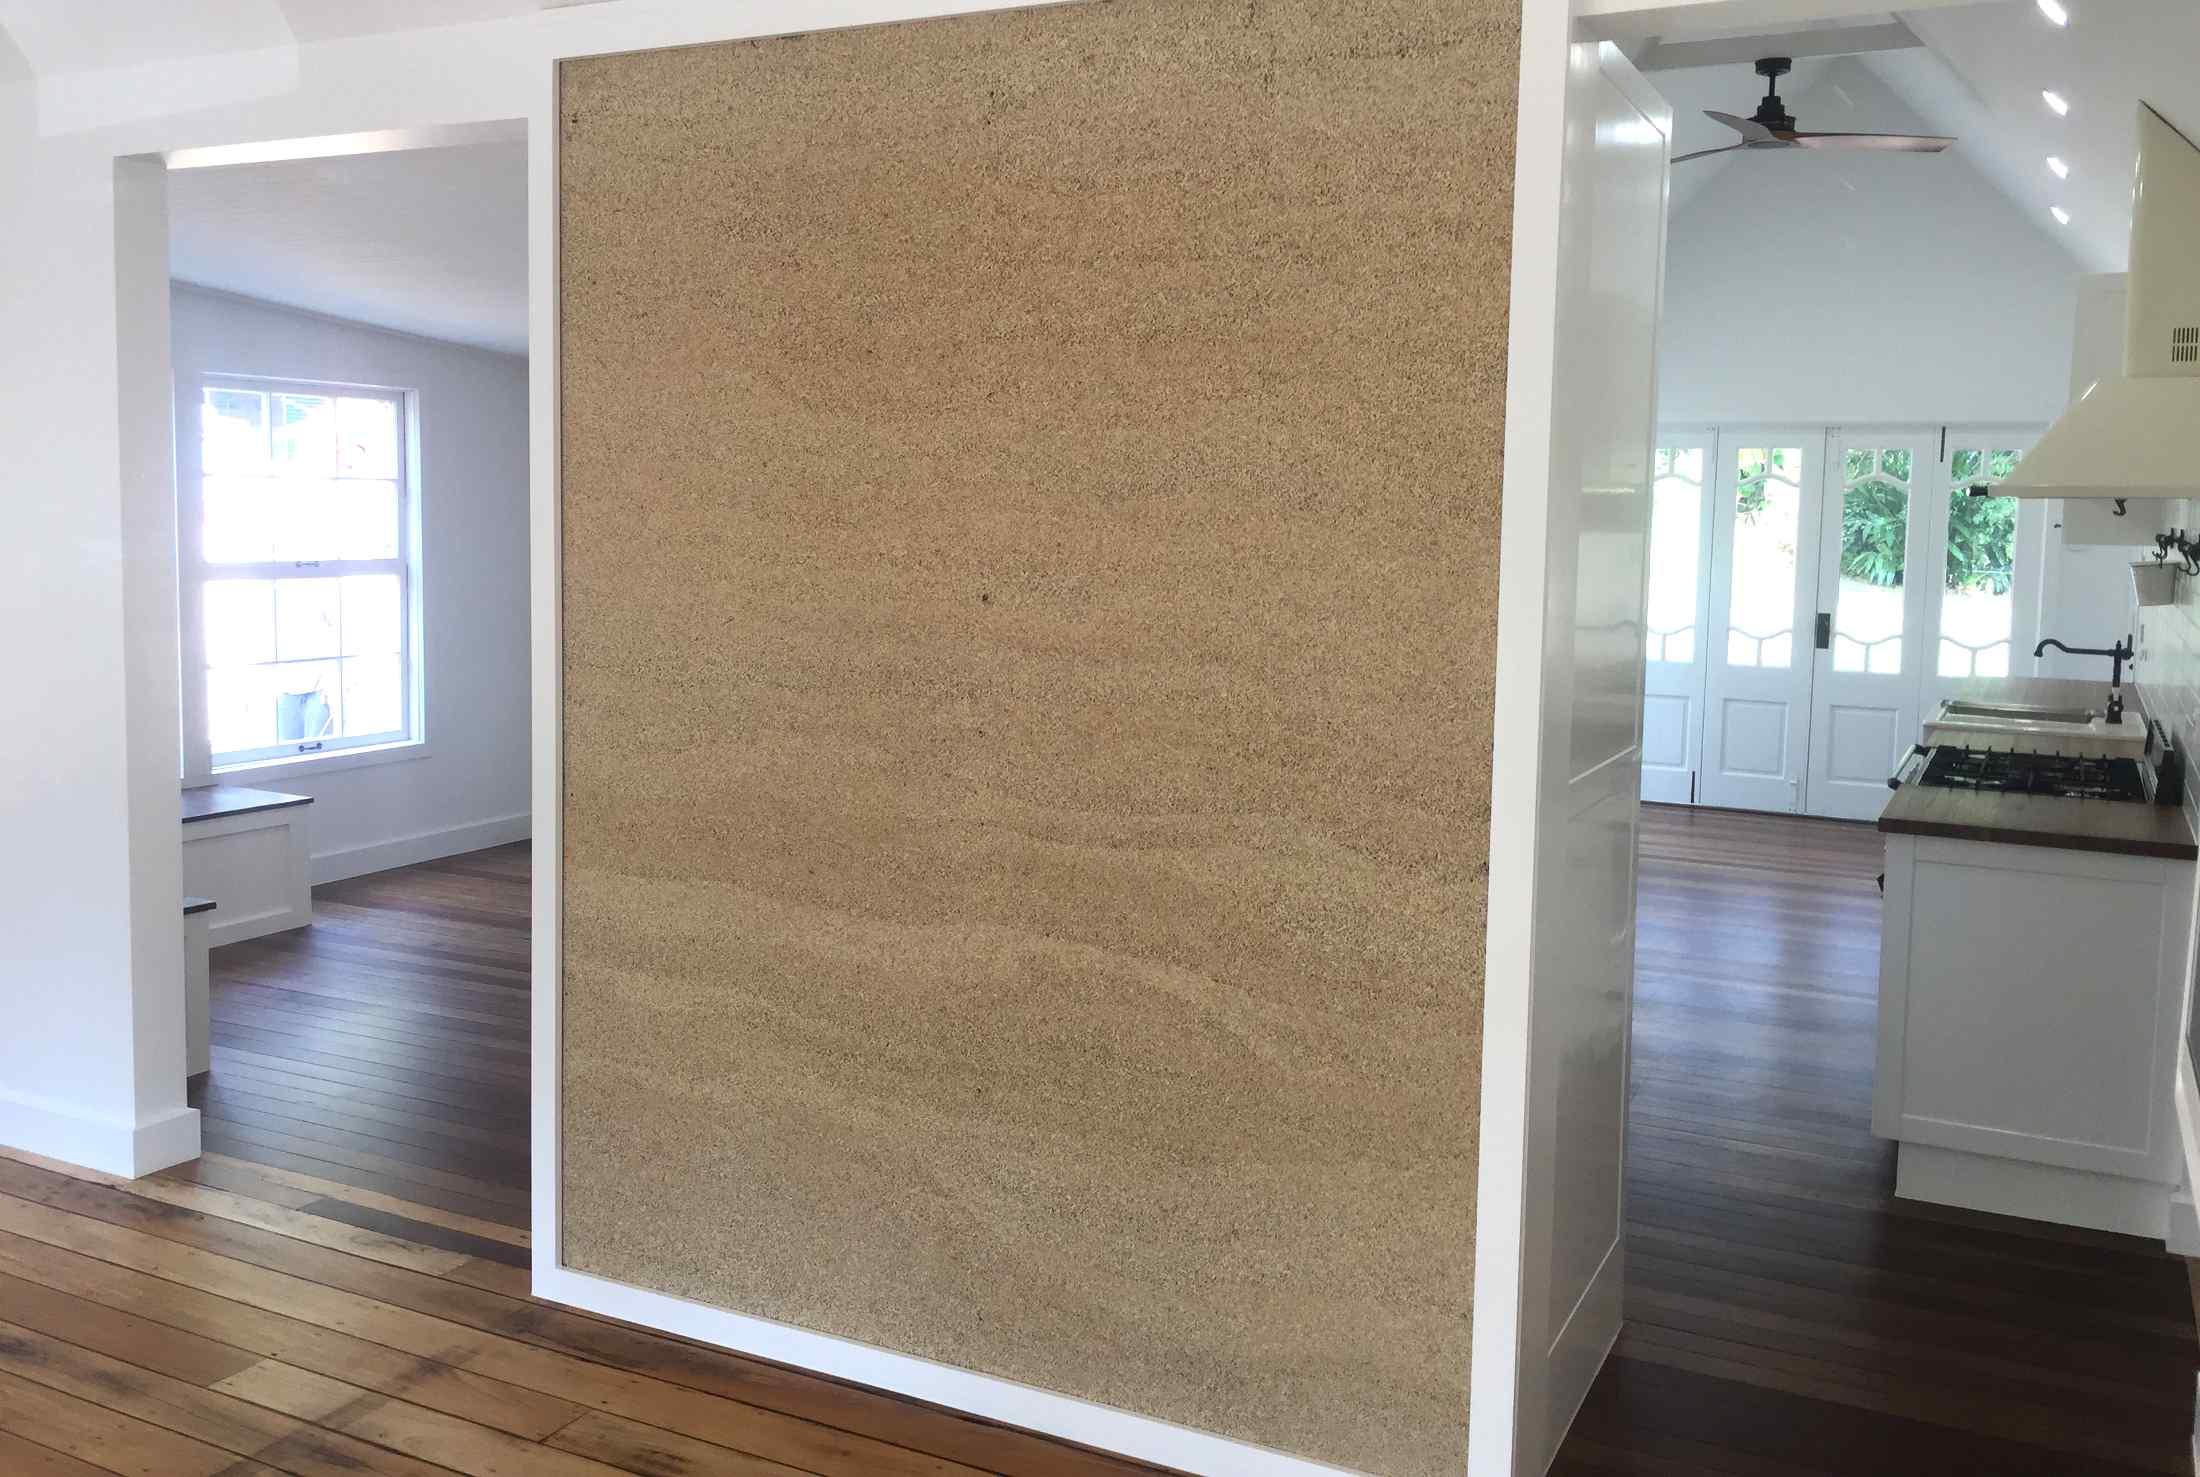 New feature hemp wall